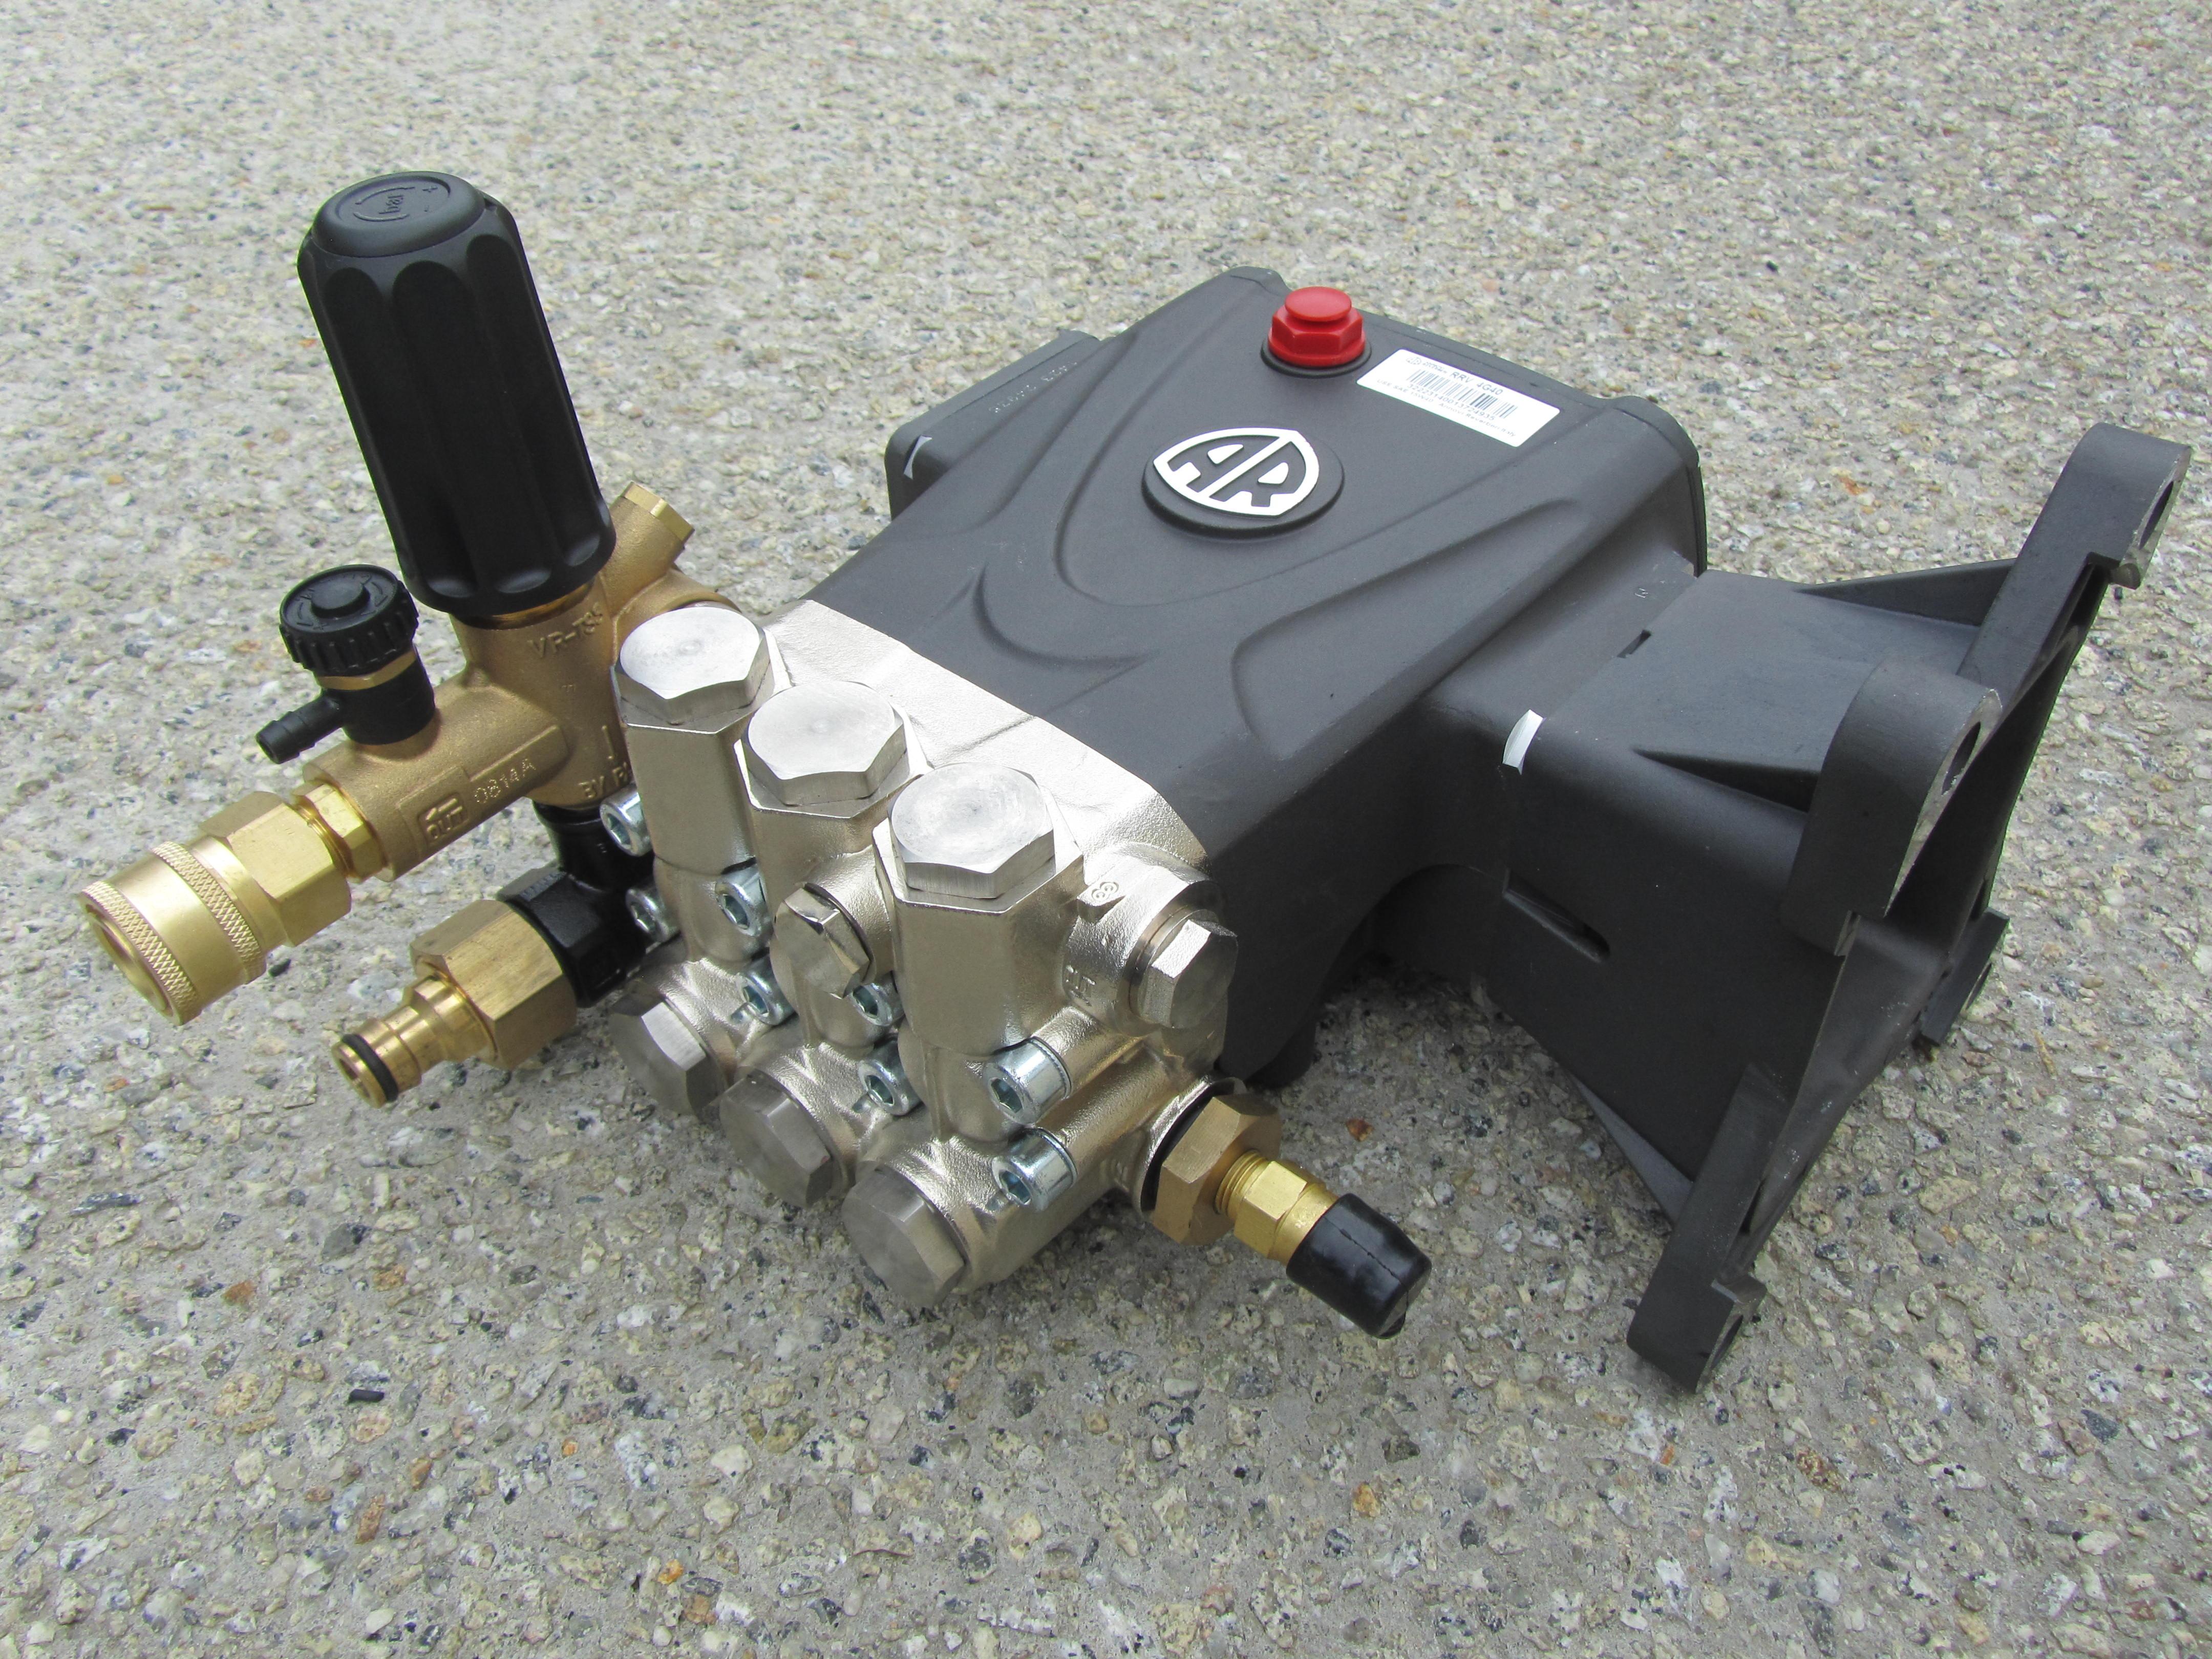 Pump Motor Wiring Diagram Further Ultra Jet Circulation Pump In